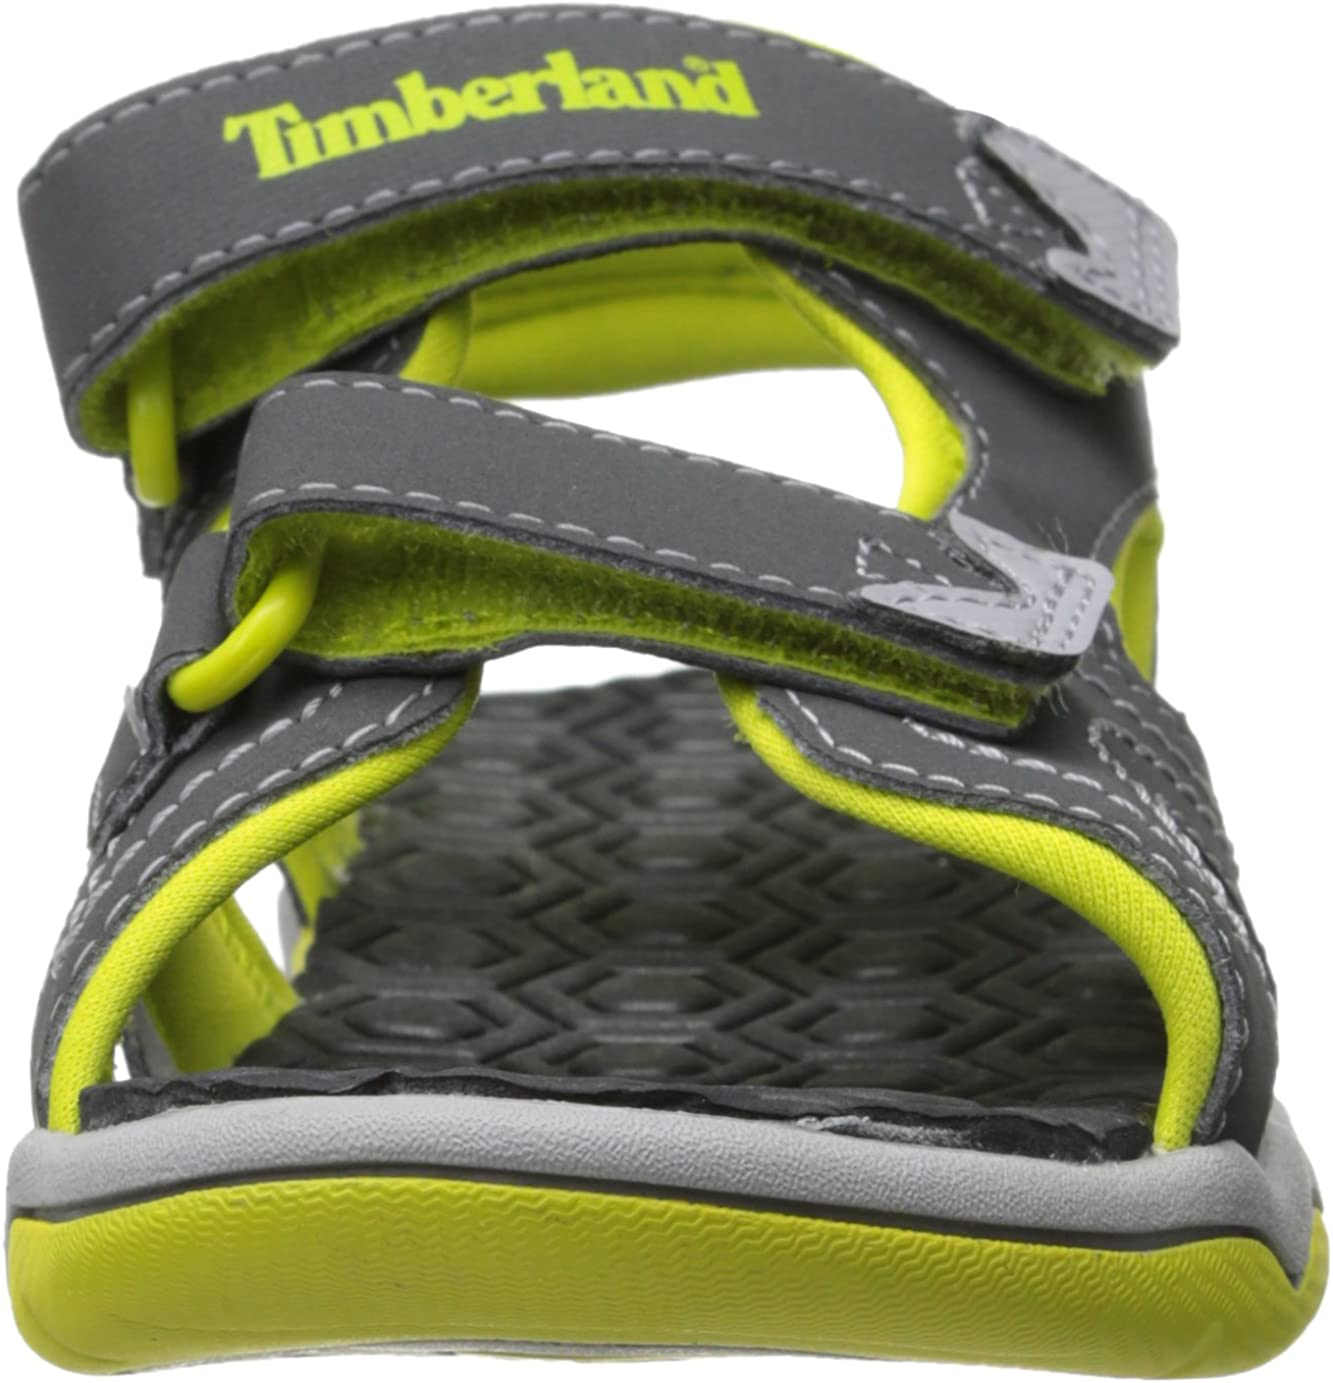 Timberland Unisex Kids Adventure Seeker 2 Strap Sandals